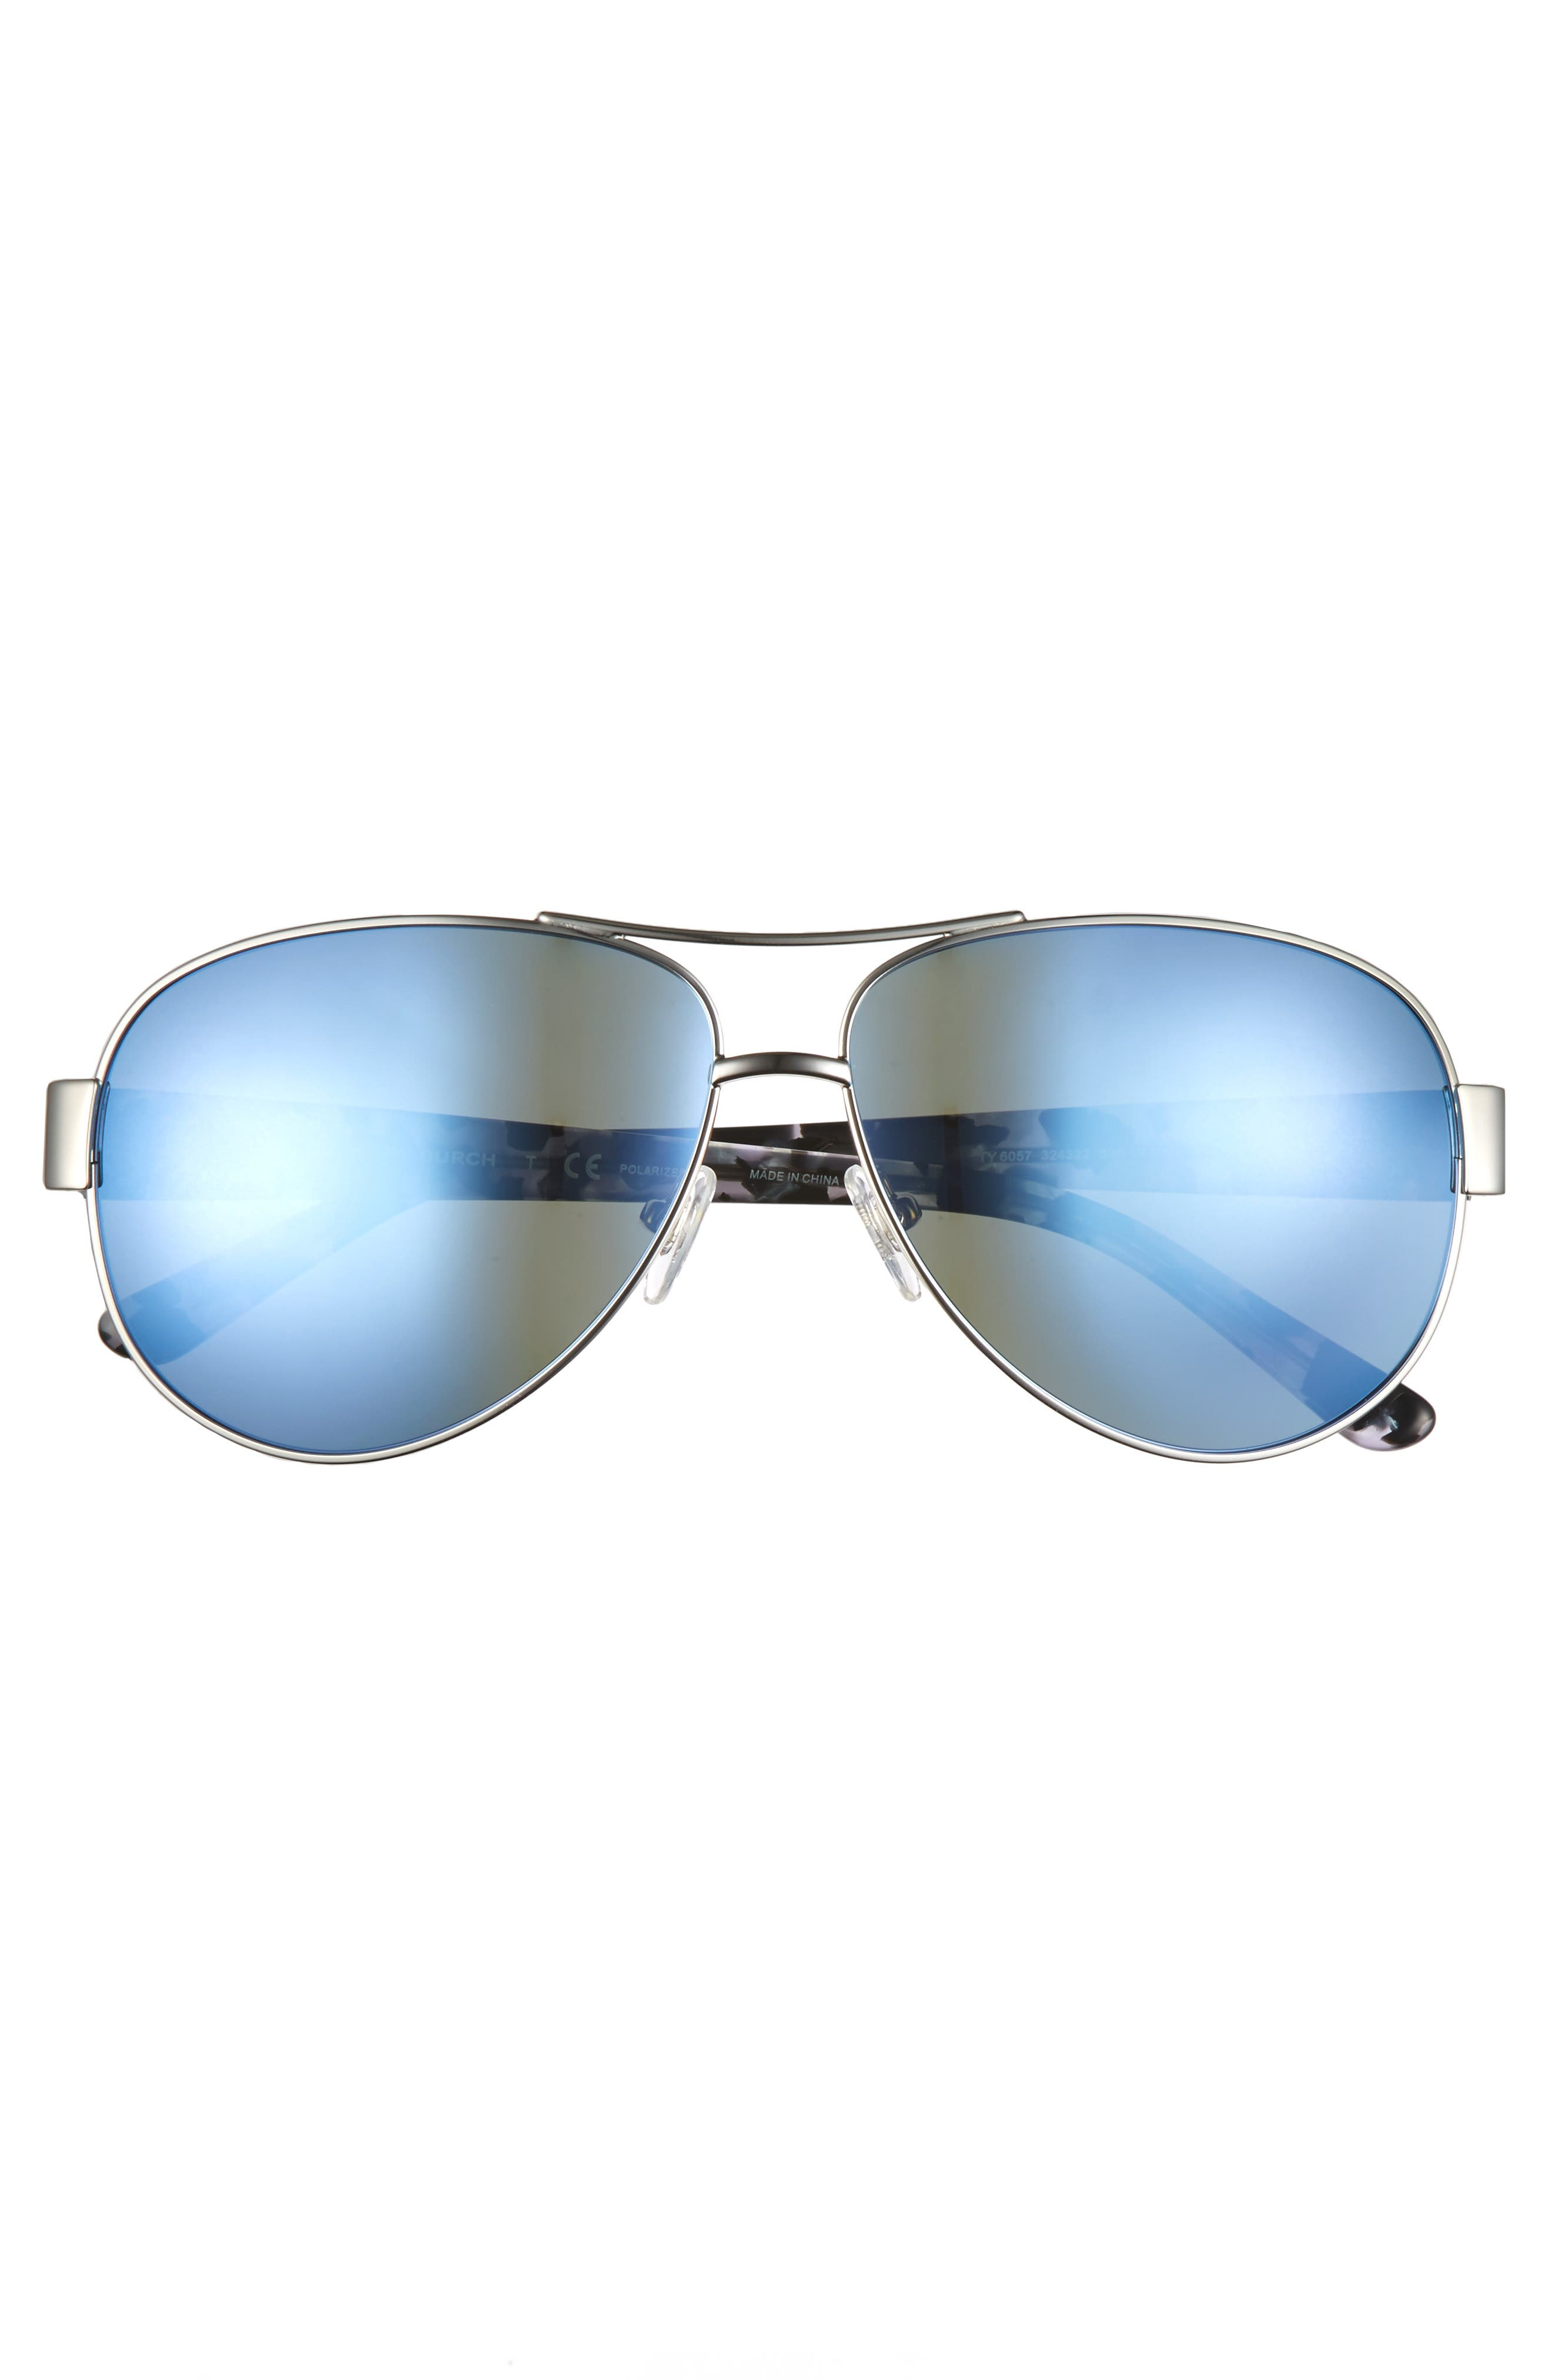 60mm Polarized Aviator Sunglasses,                             Alternate thumbnail 3, color,                             040